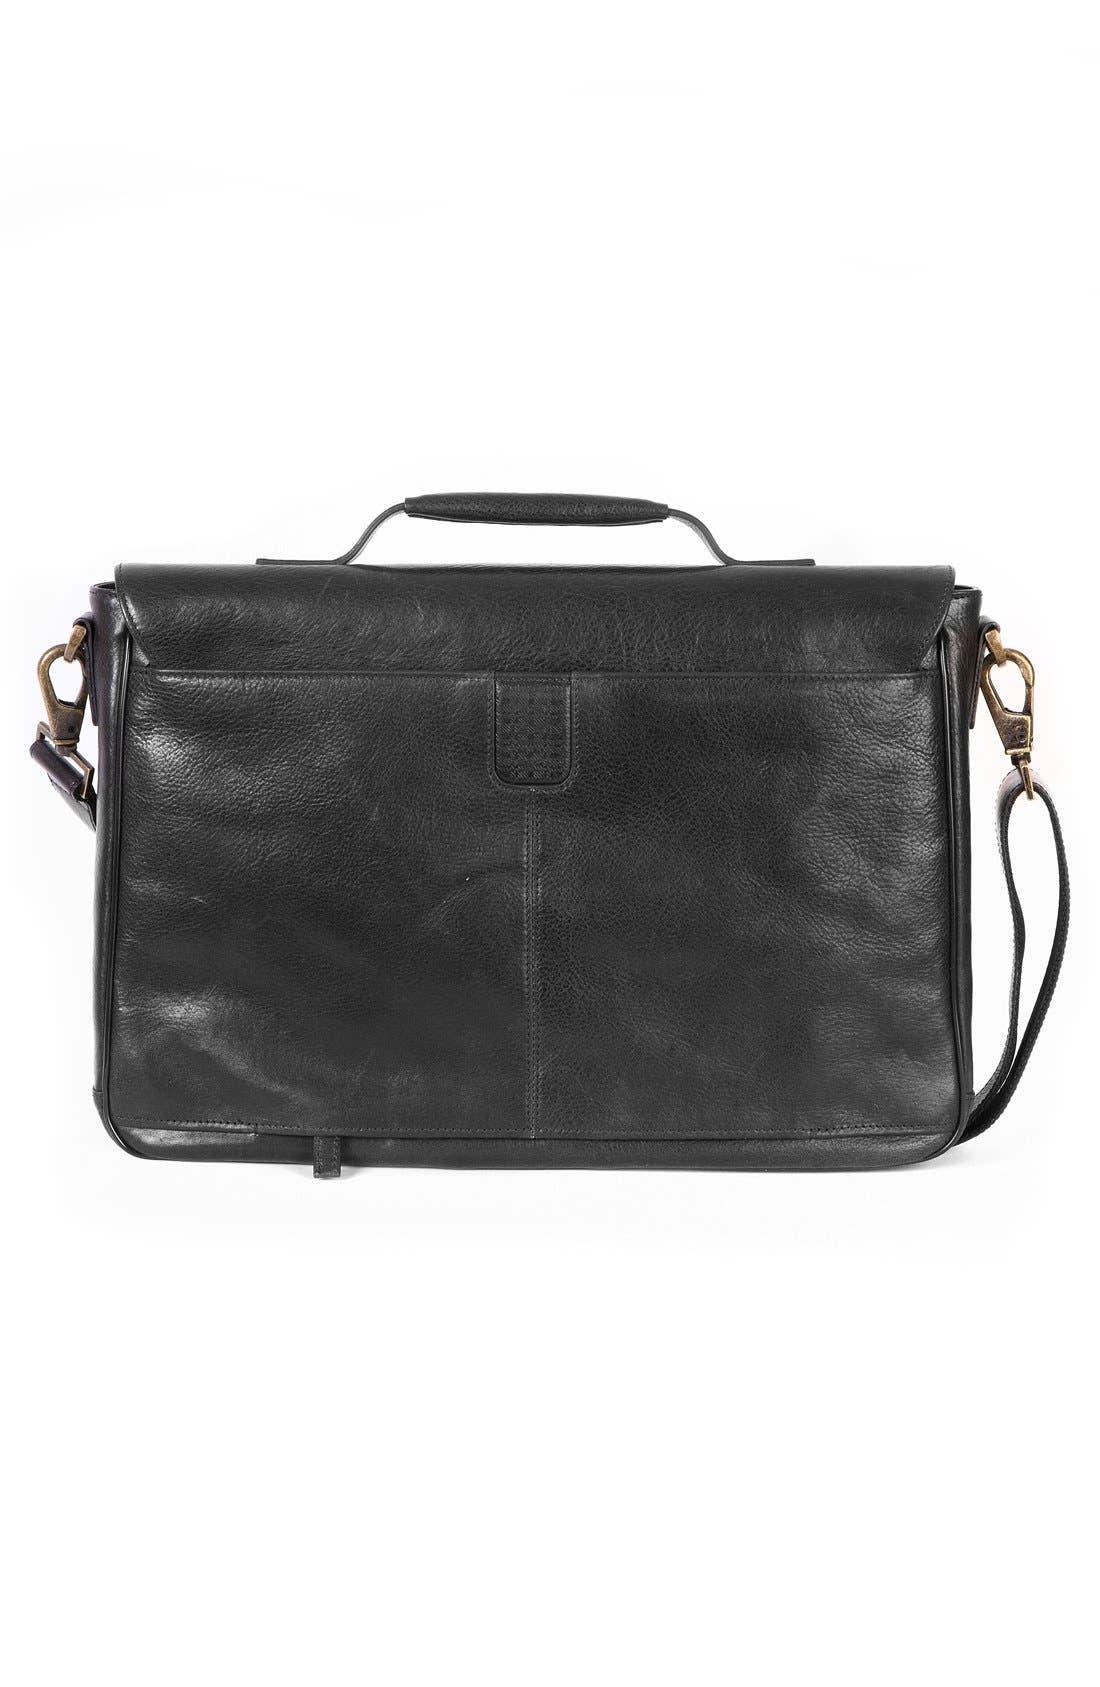 'Becker' Leather Messenger Bag,                             Alternate thumbnail 2, color,                             BLACK W/ KHAKI